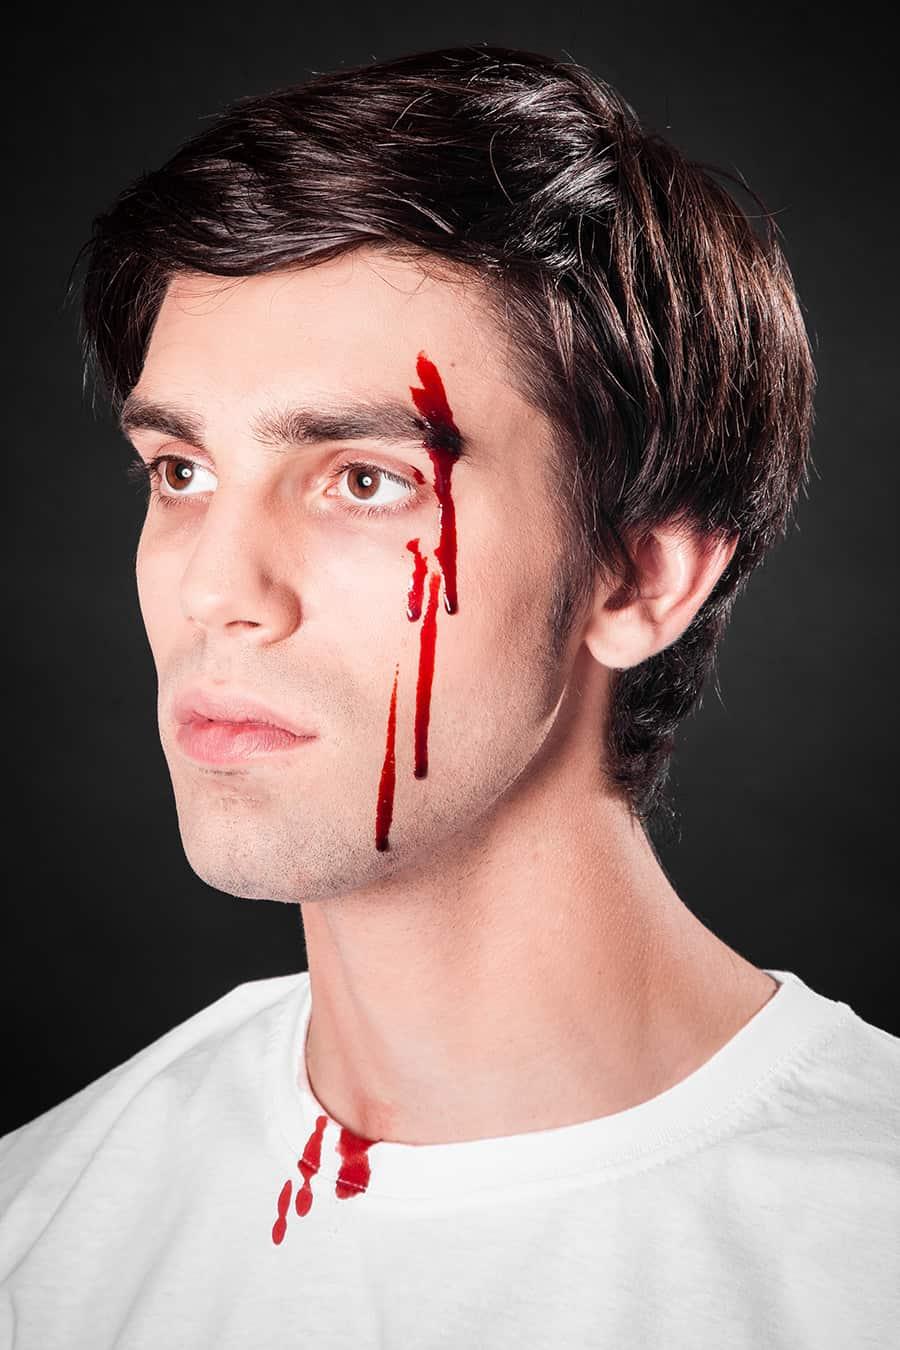 Bluteffekte Blut Schminken Wunden Schminken Zu Halloween